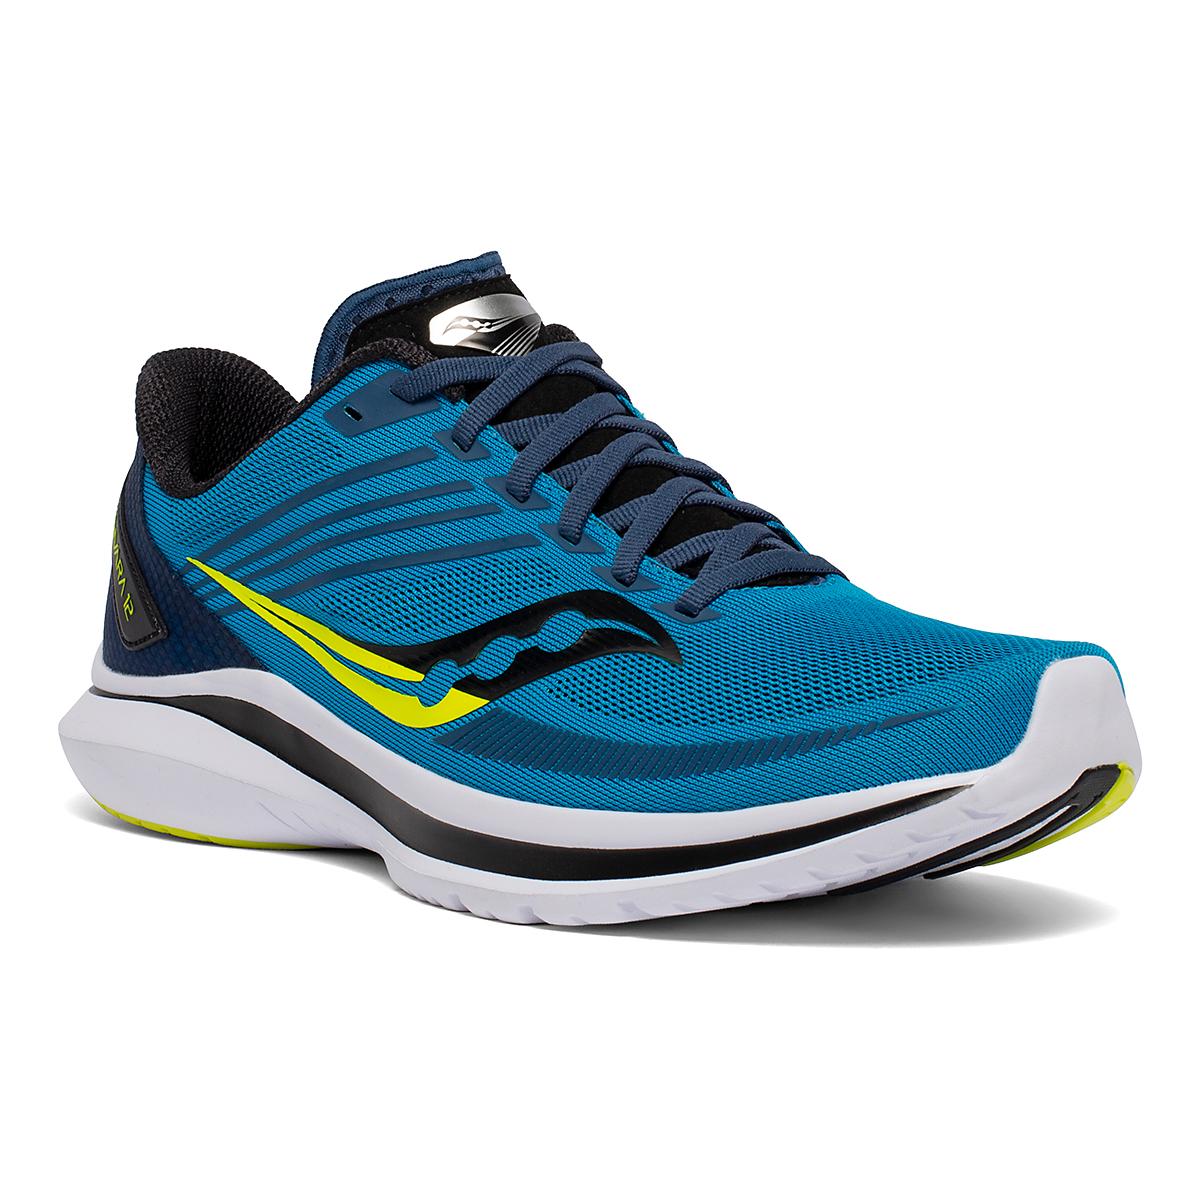 Men's Saucony Kinvara 12 Running Shoe - Color: Cobalt/Citrus - Size: 7 - Width: Regular, Cobalt/Citrus, large, image 3